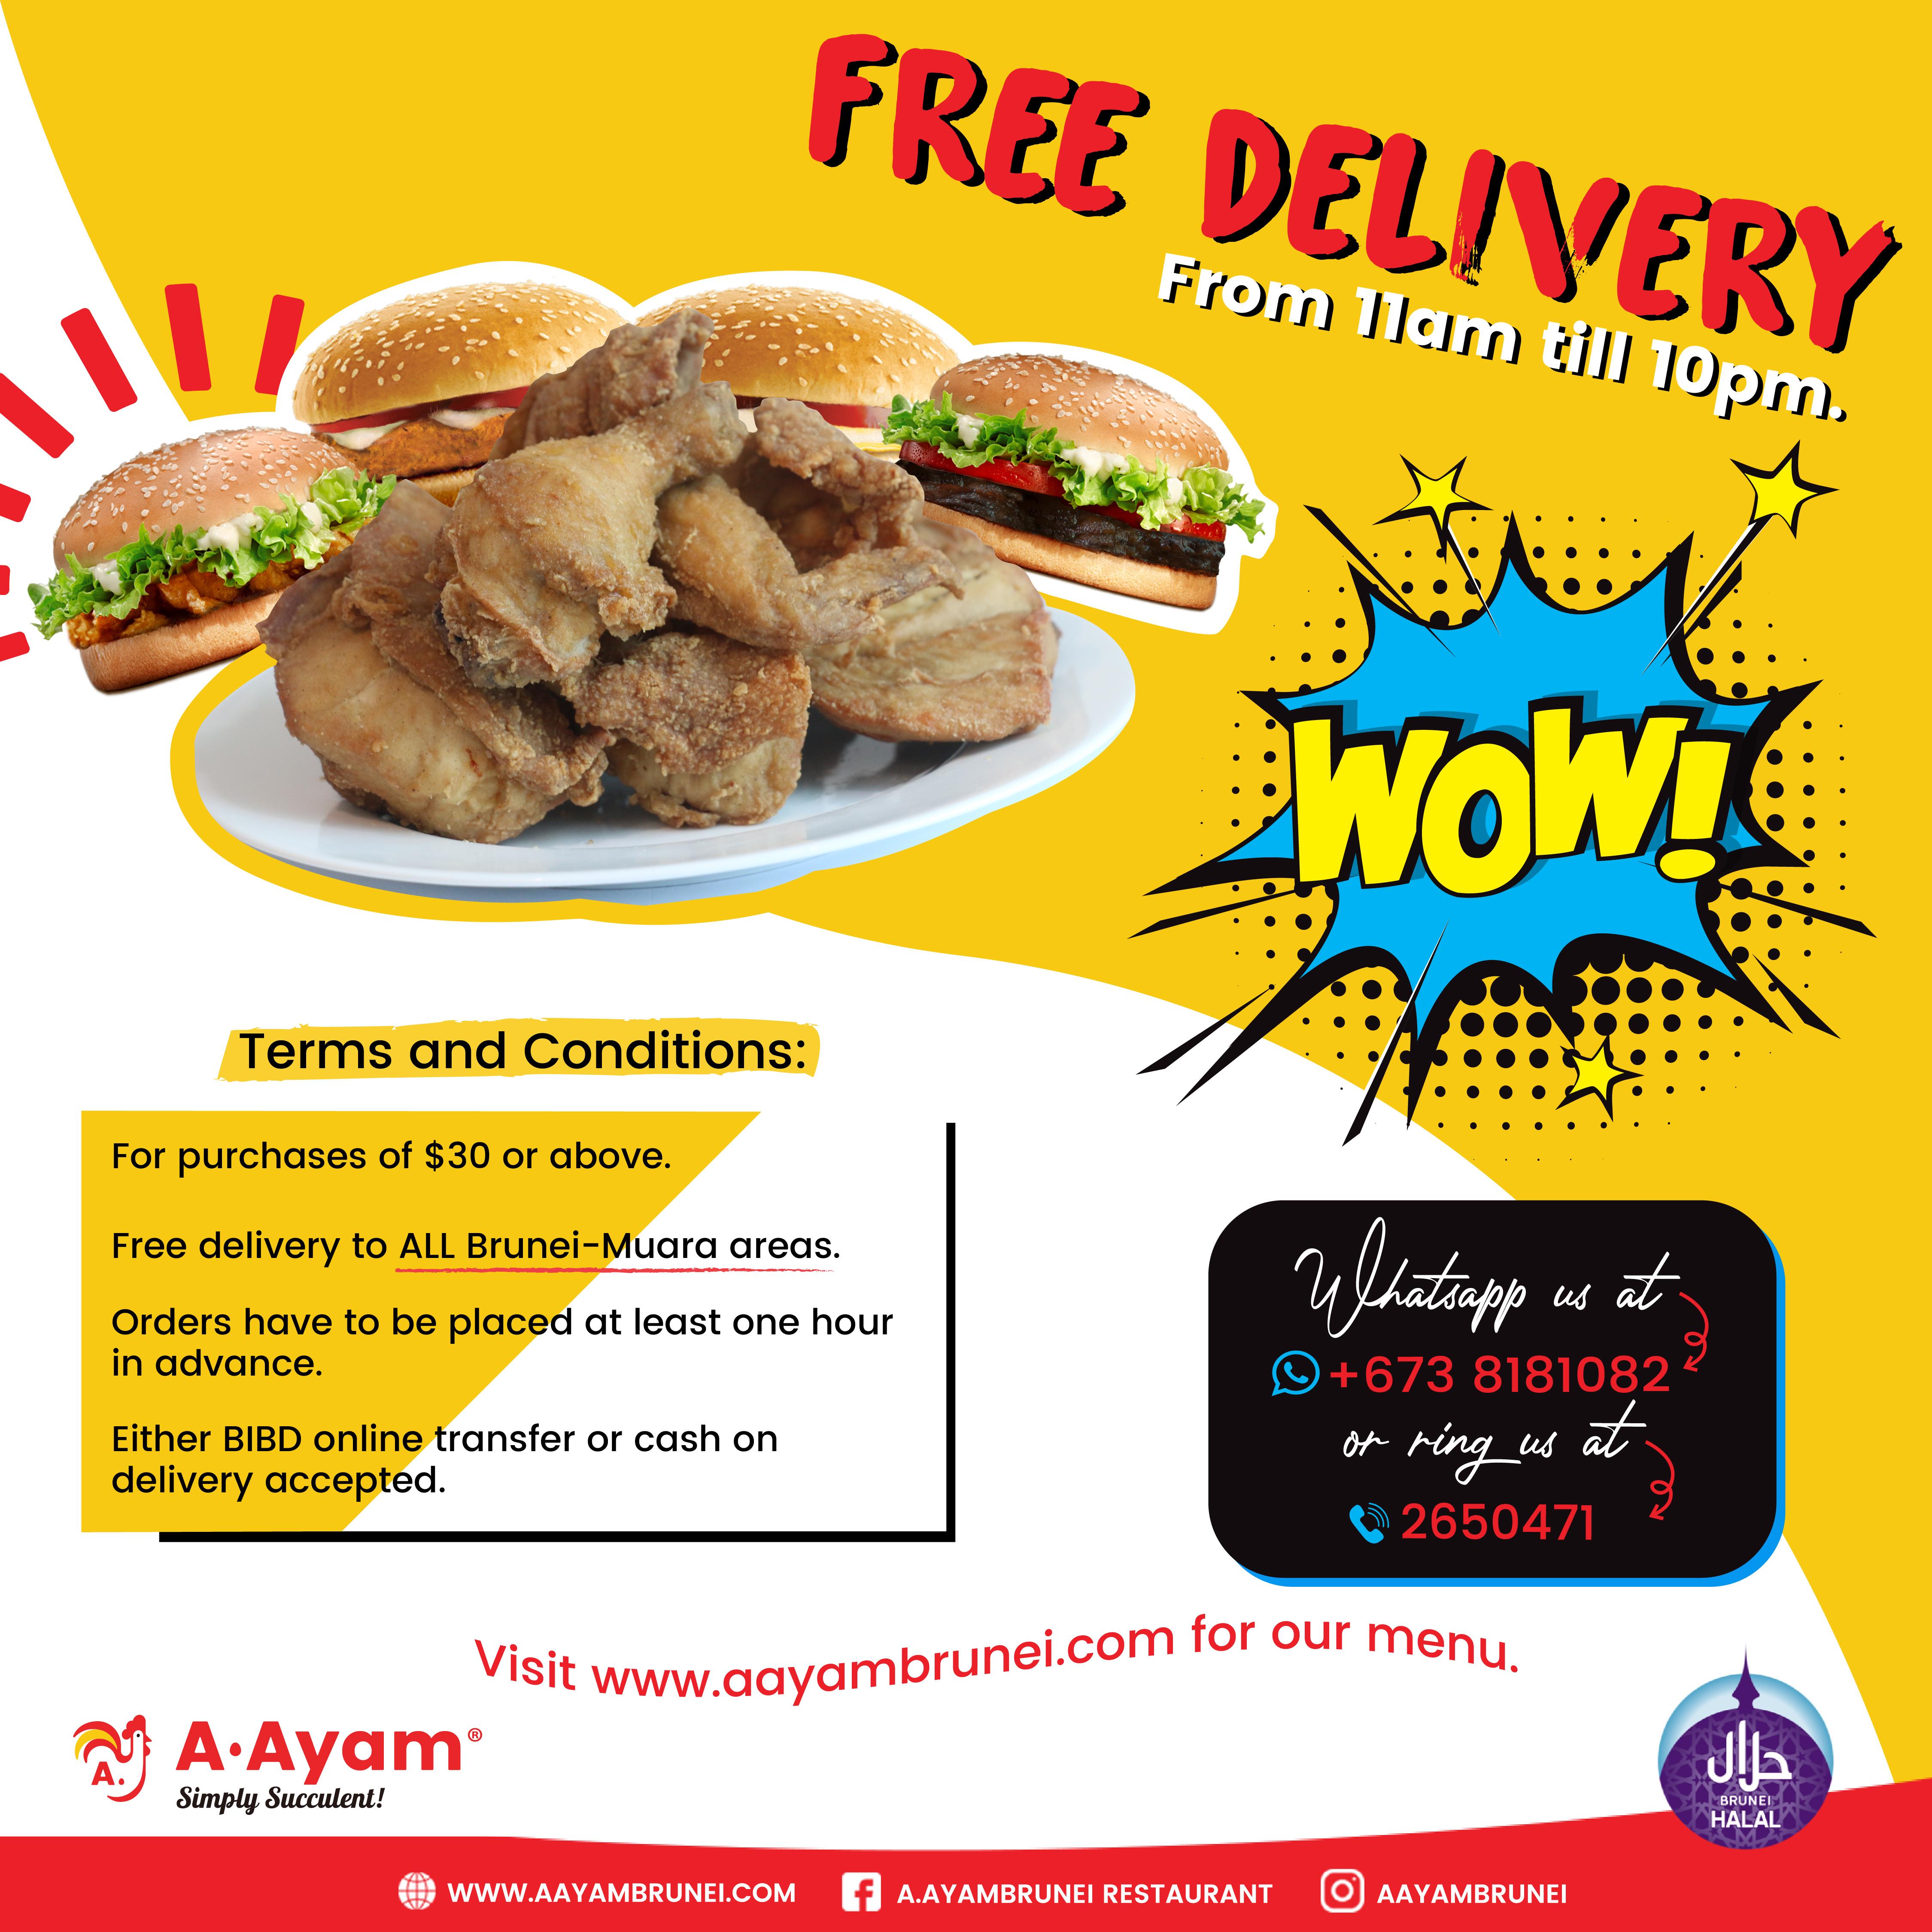 free delivery brunei muara-01